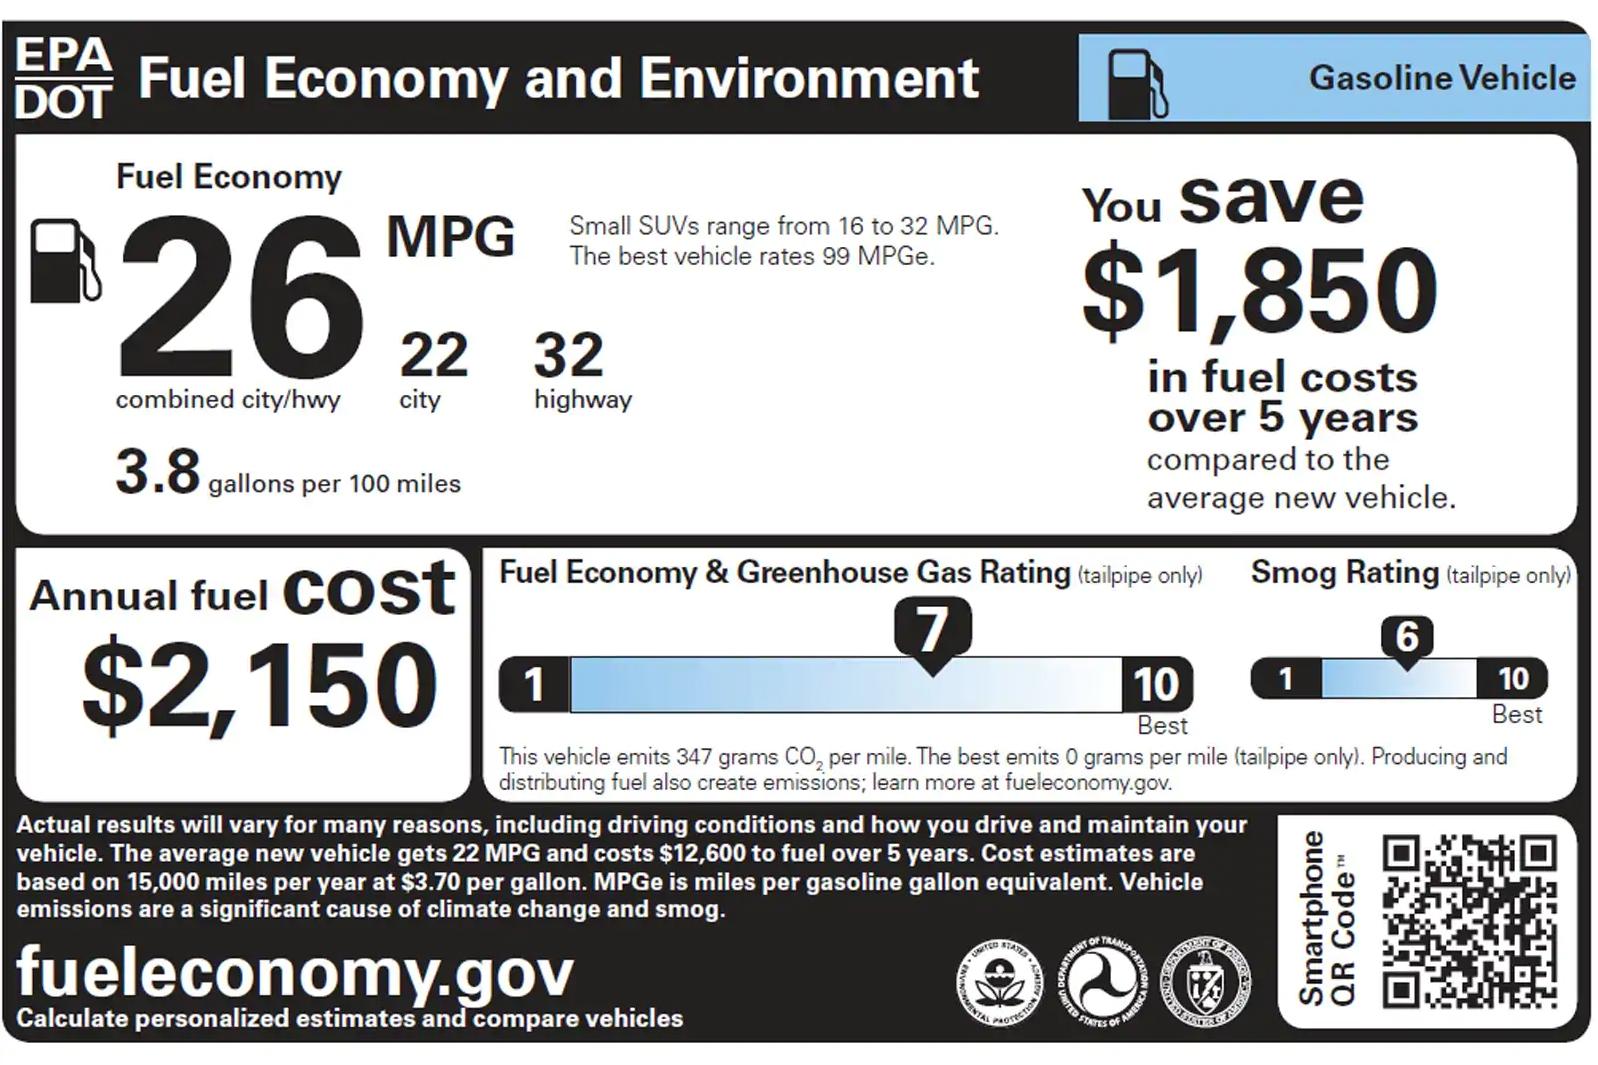 EPA Fuel Economy sticker